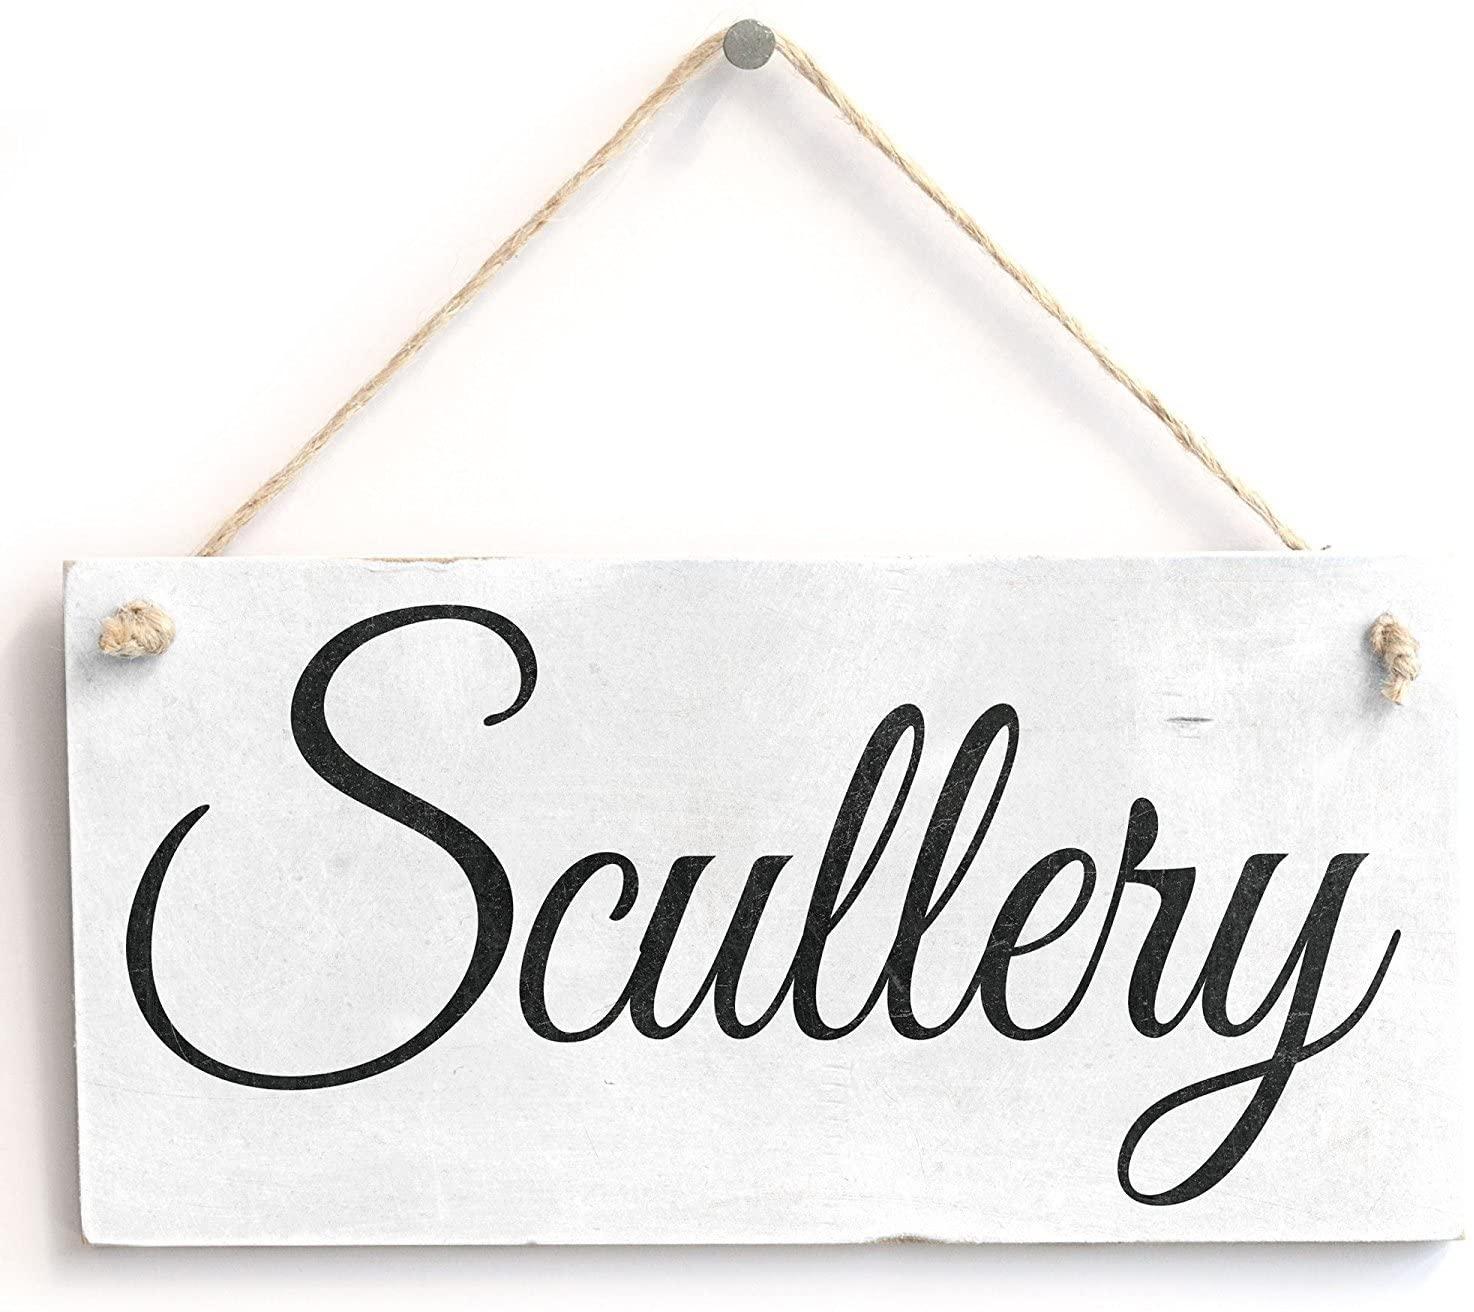 Meijiafei Scullery - Vintage PVC Sign/Plaque 10